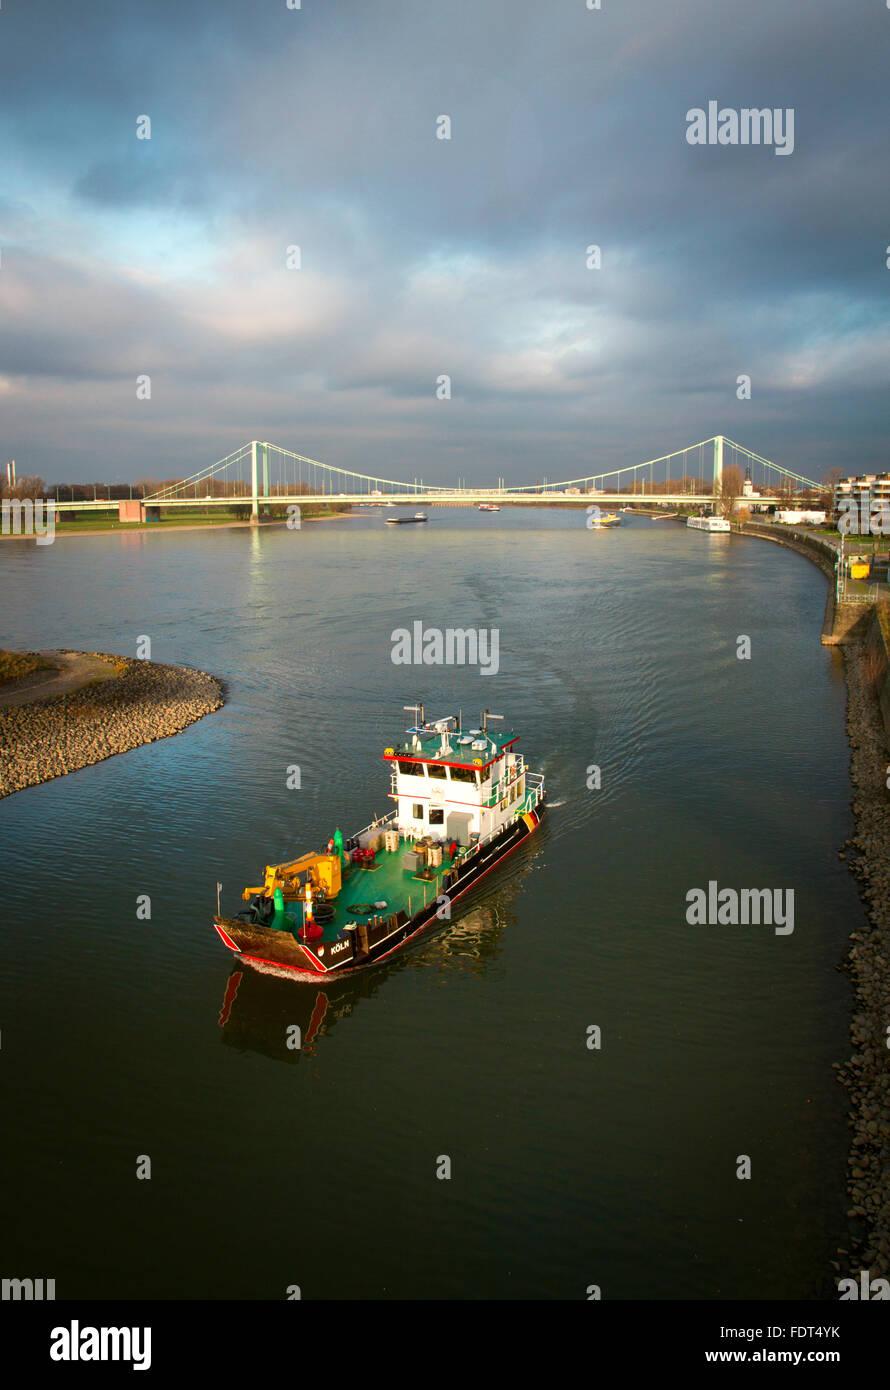 rhine river - Stock Image